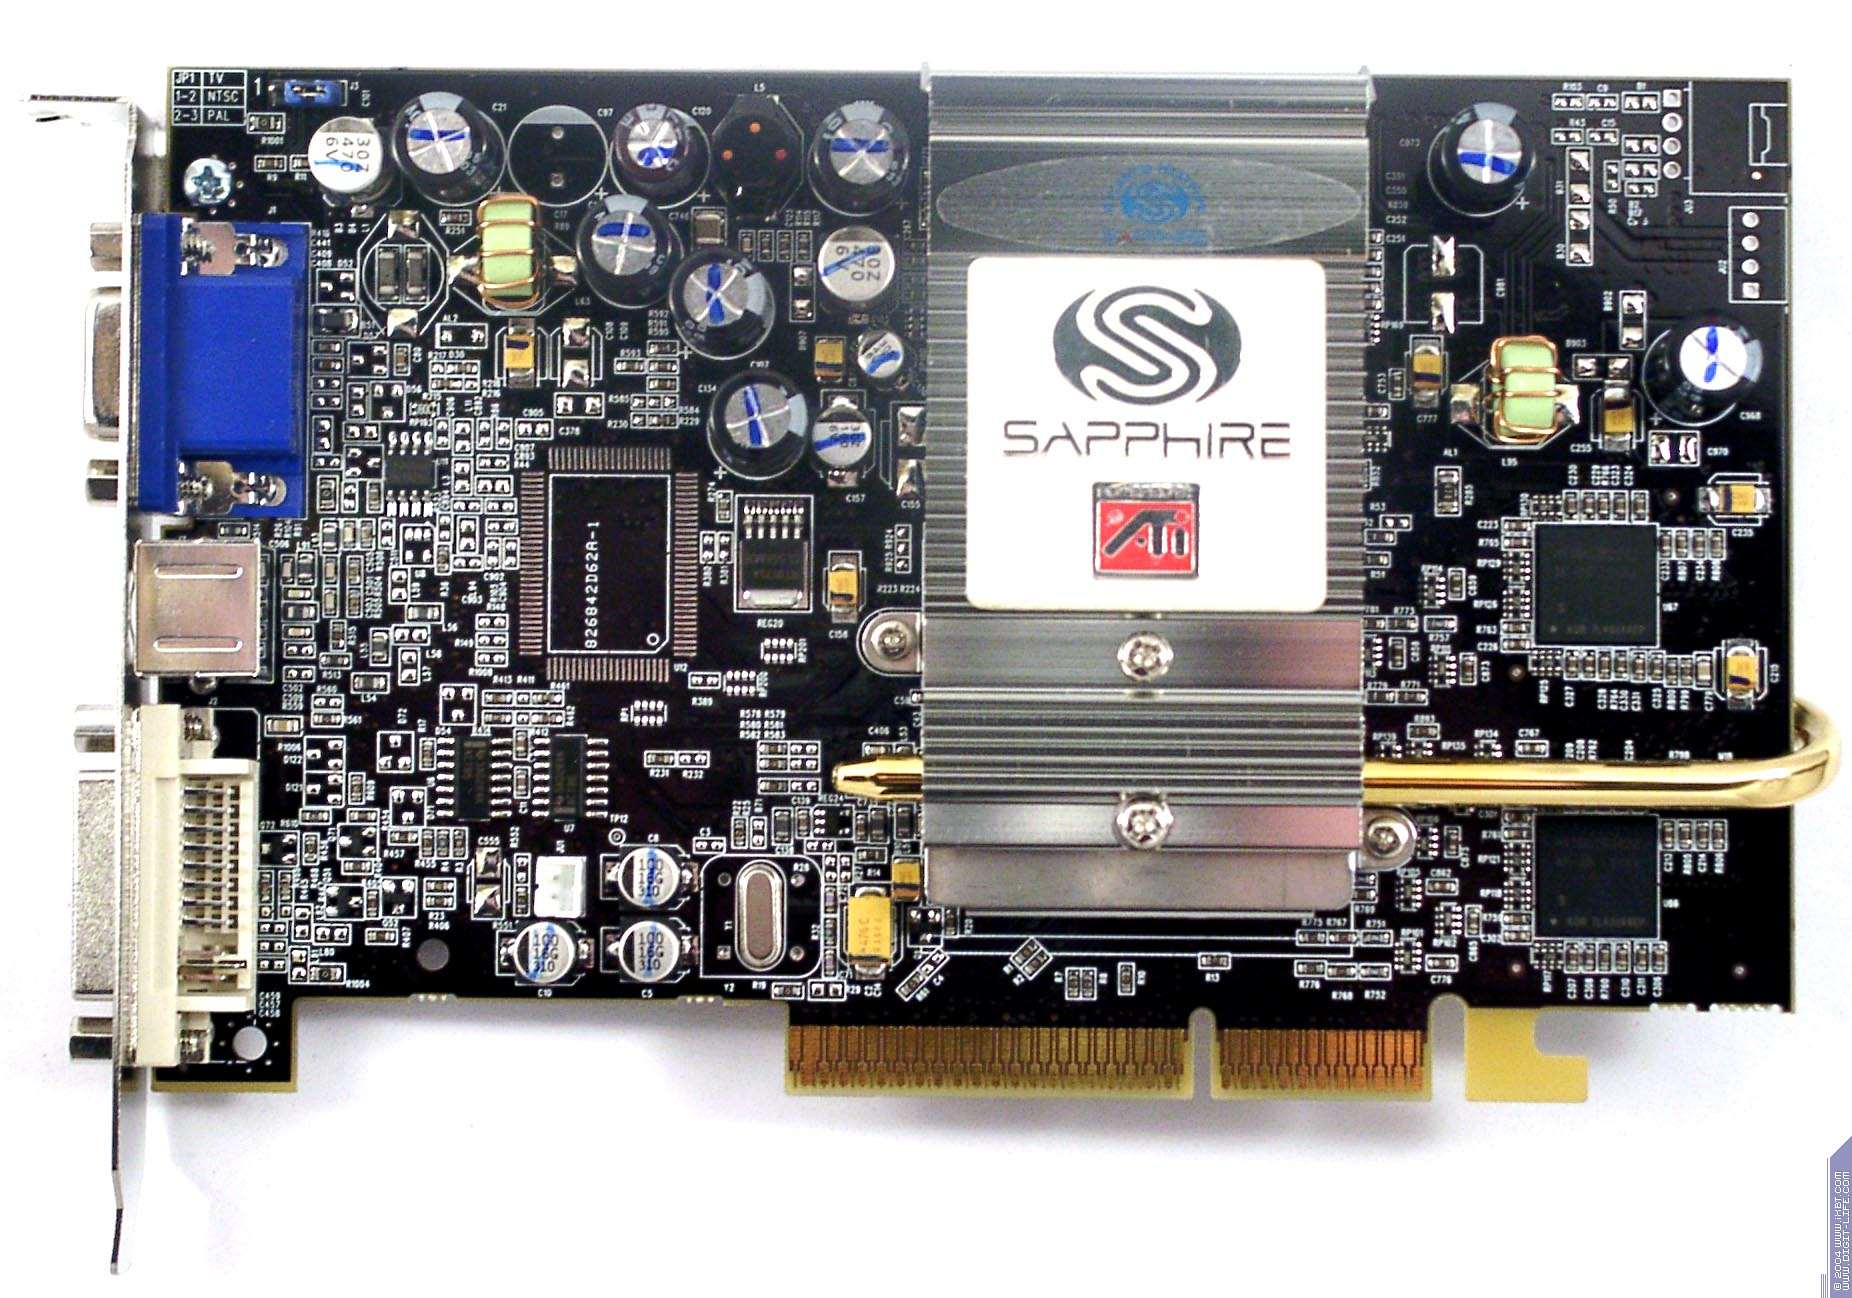 AMD RADEON 9600XT DRIVERS FOR WINDOWS VISTA